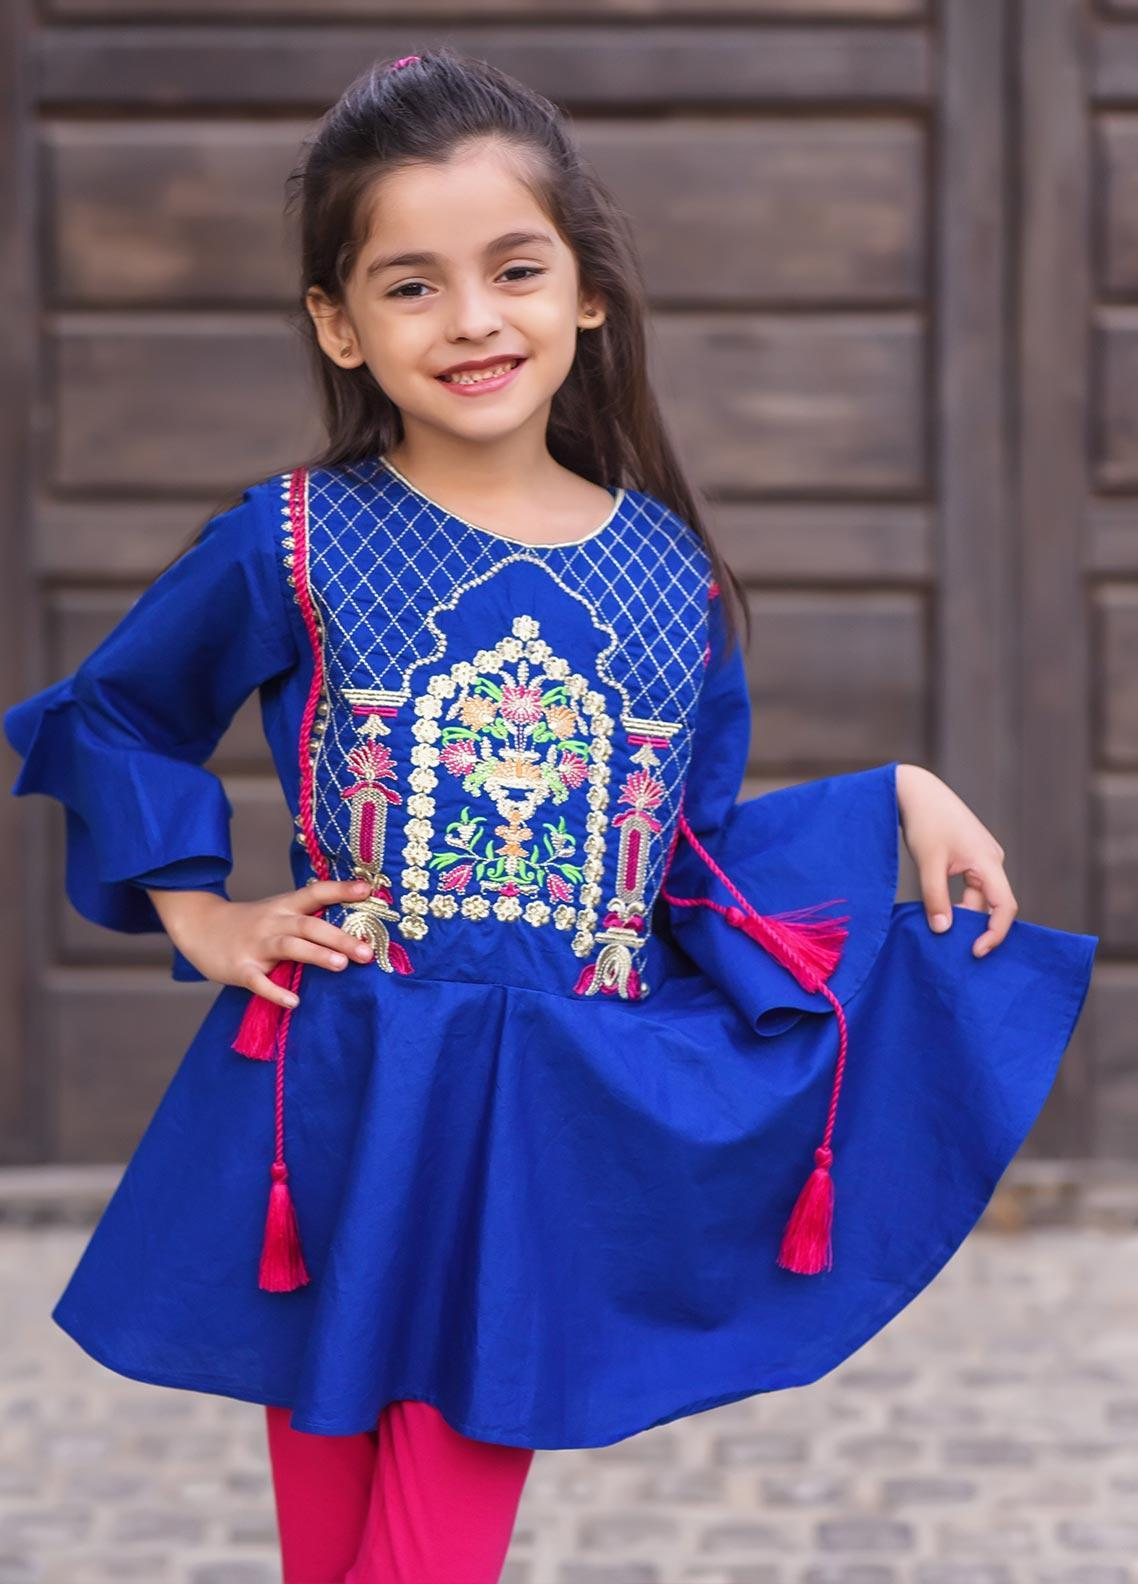 Ochre Cotton Formal Kurti for Girls -  OFK 625 Royal Blue